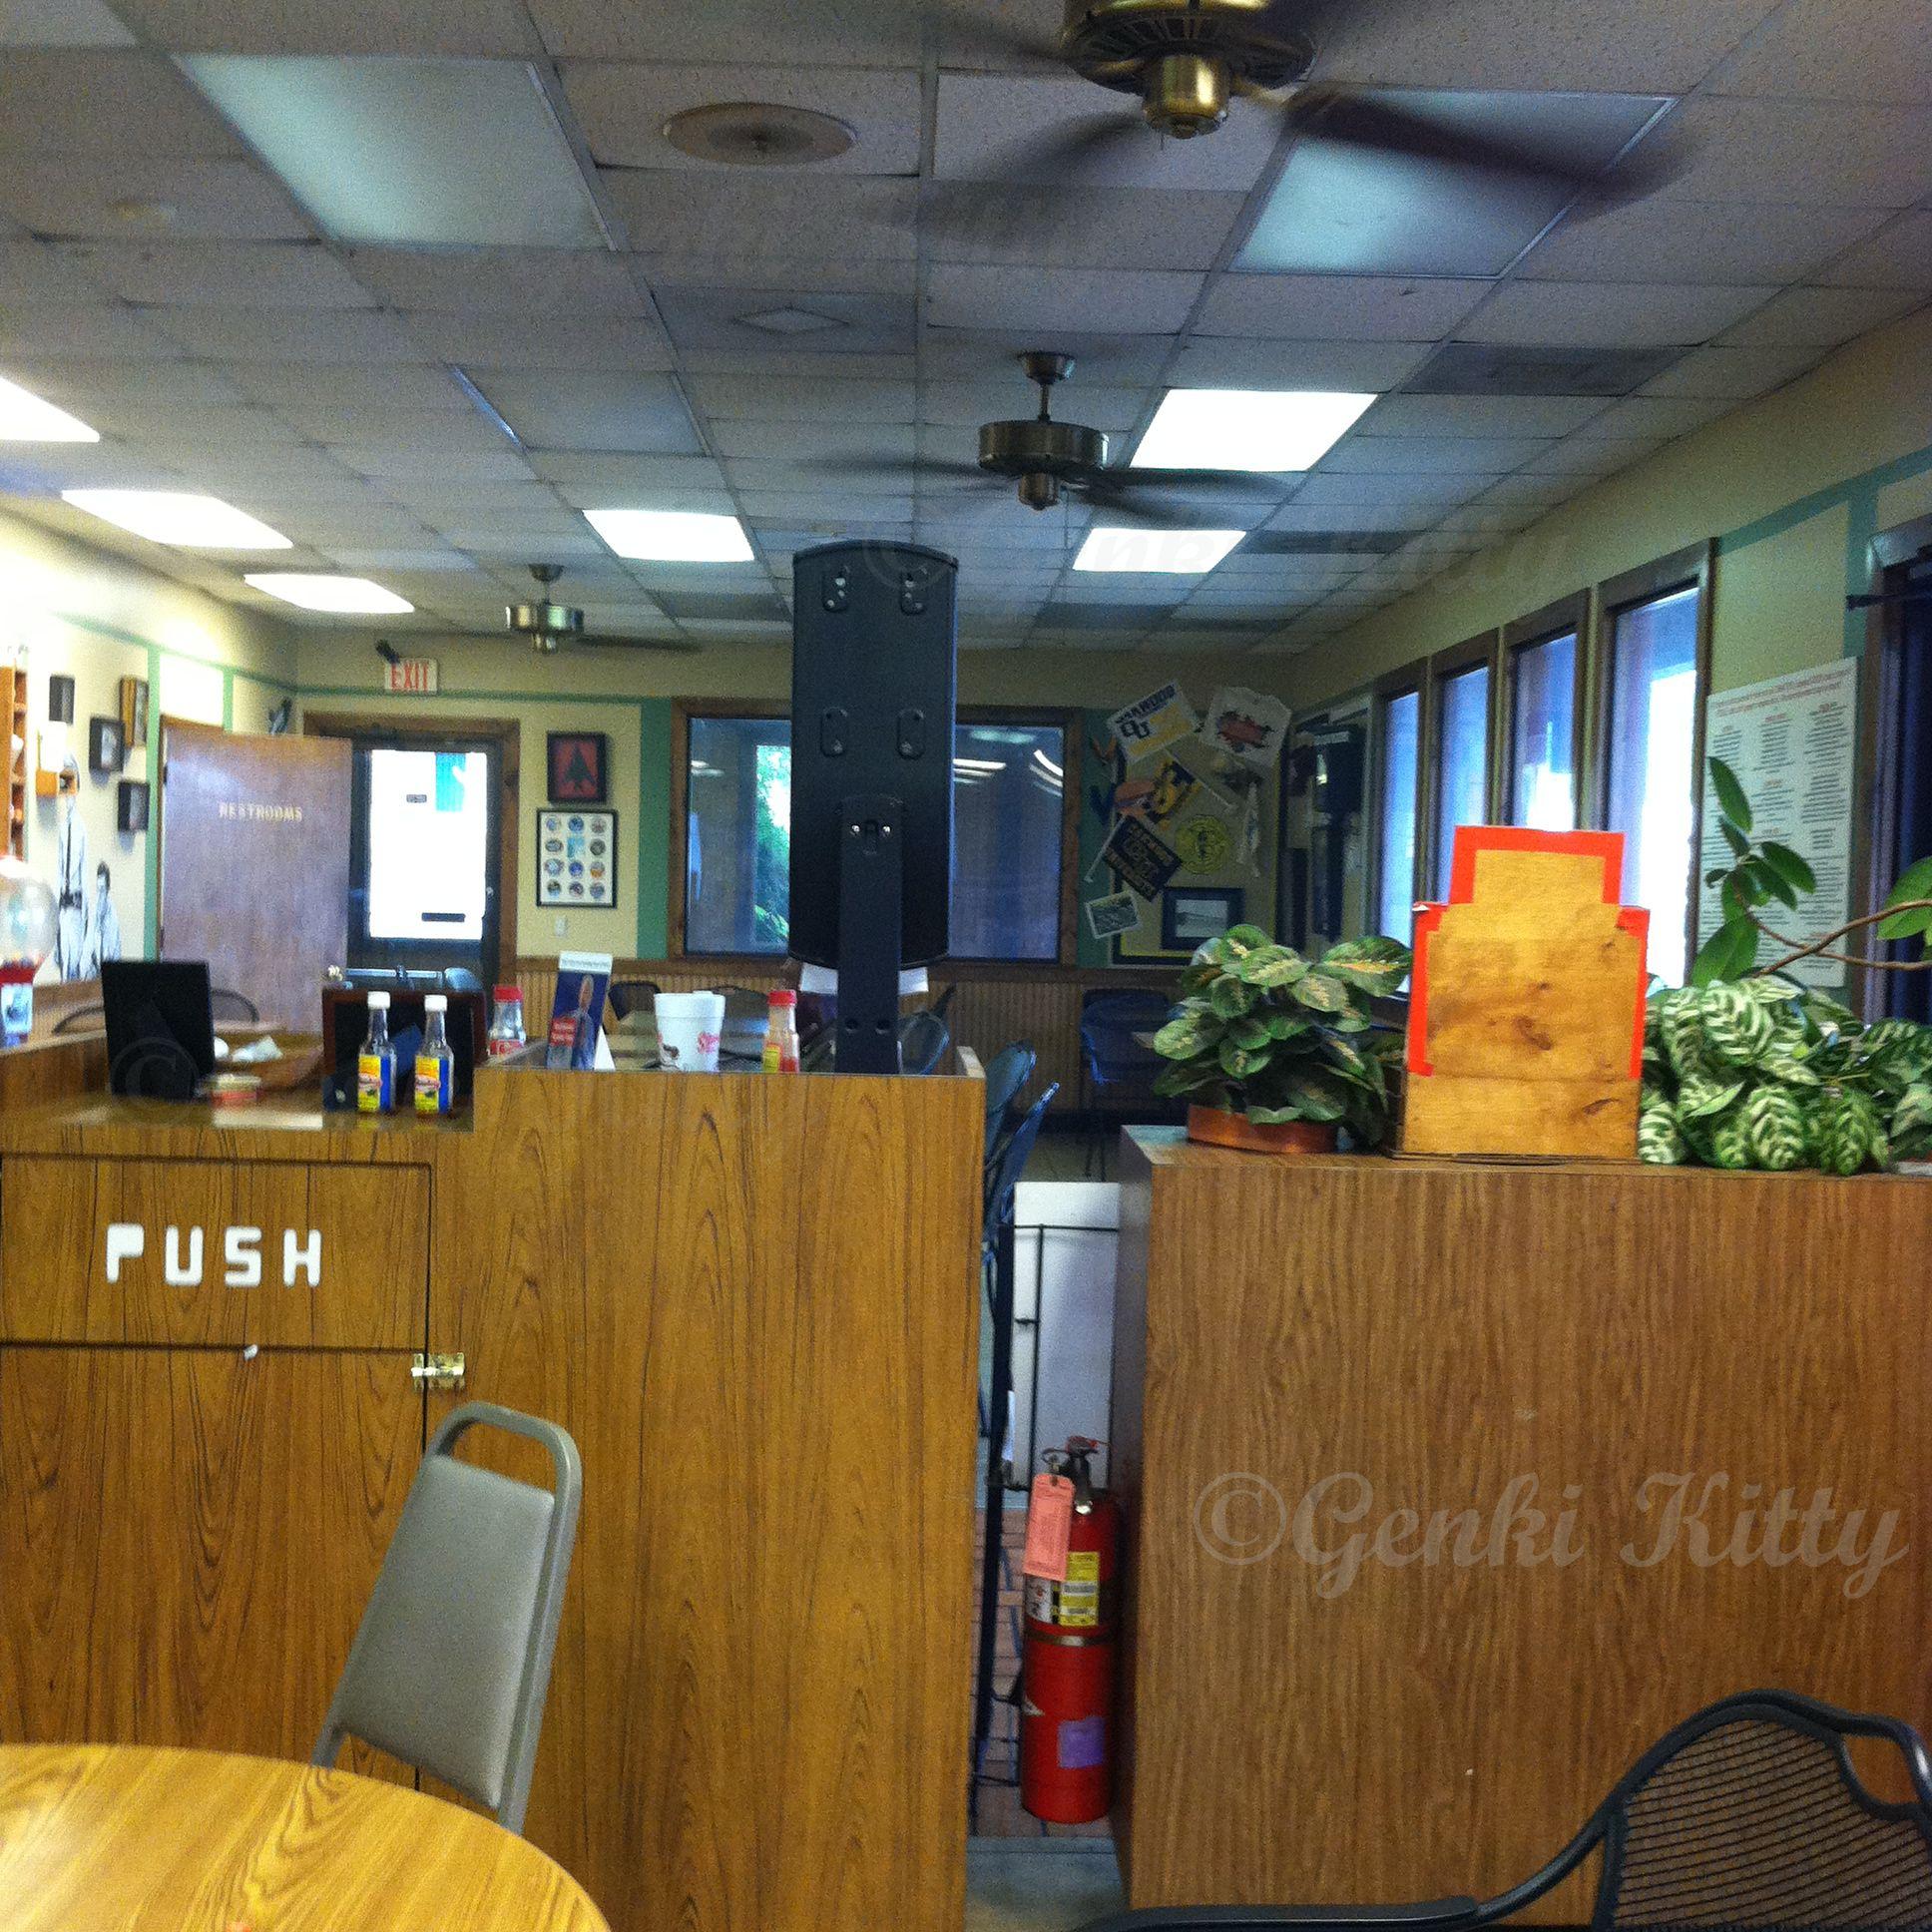 Stanlieo's Sub Villa in Huntsville, Alabama: Vegan options #stanlieosubvilla #vegan #huntsville #alabama